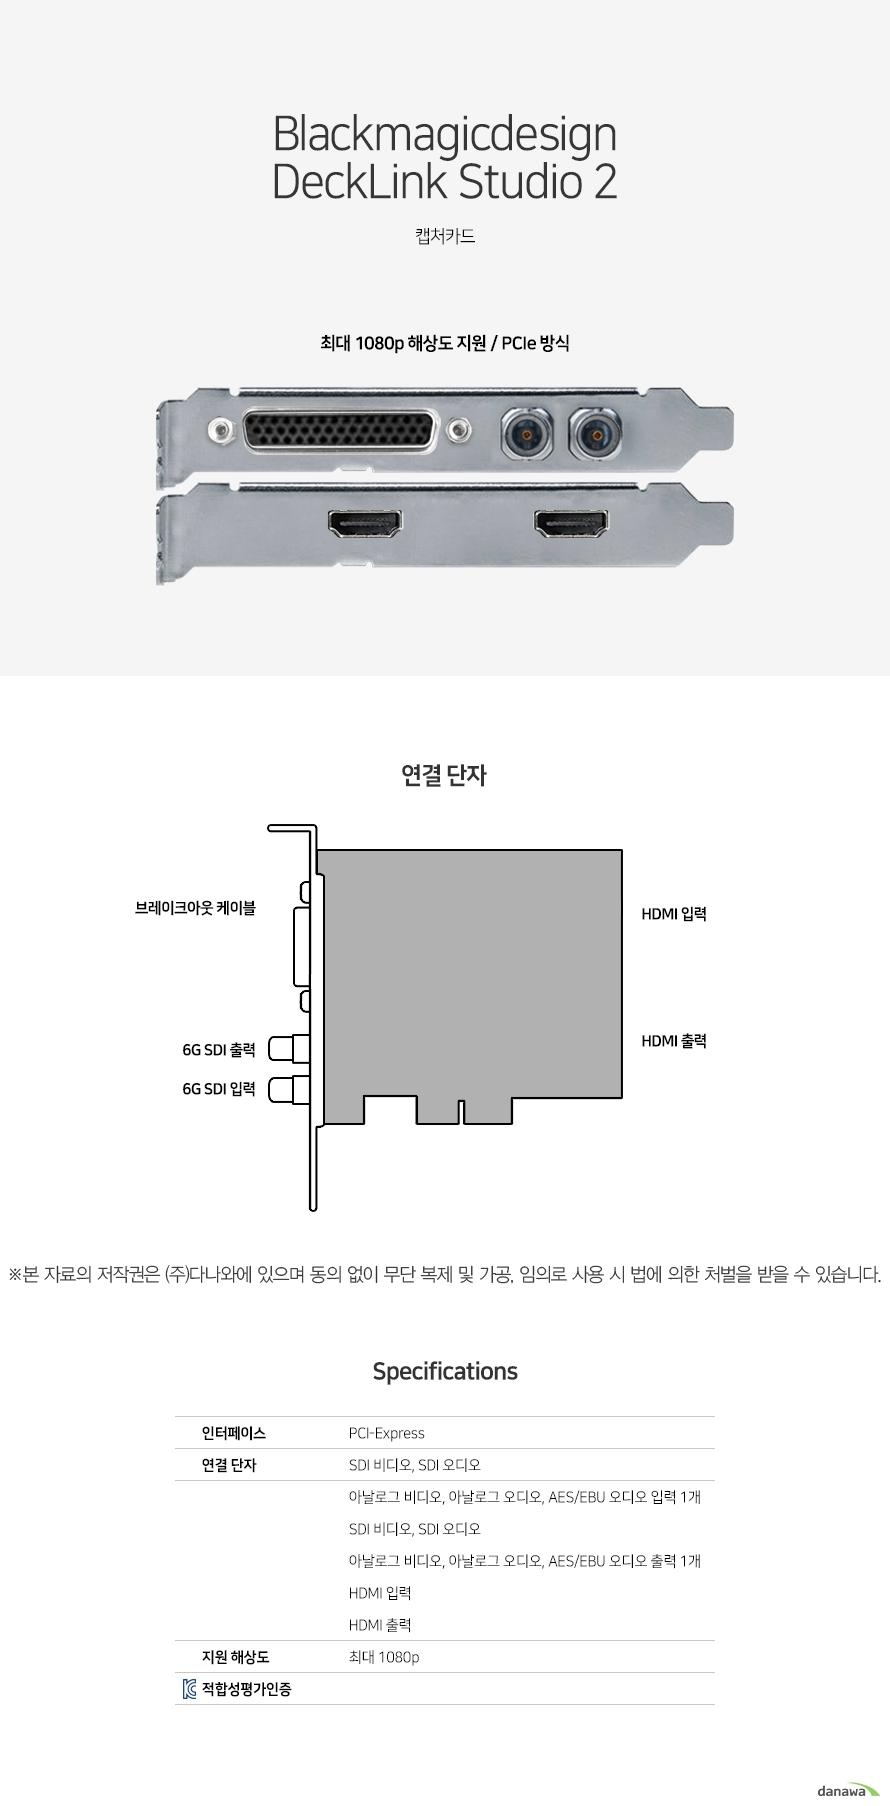 Blackmagicdesign DeckLink Duo   캡처카드 최대 1080p 해상도 지원 / PCIe 방식